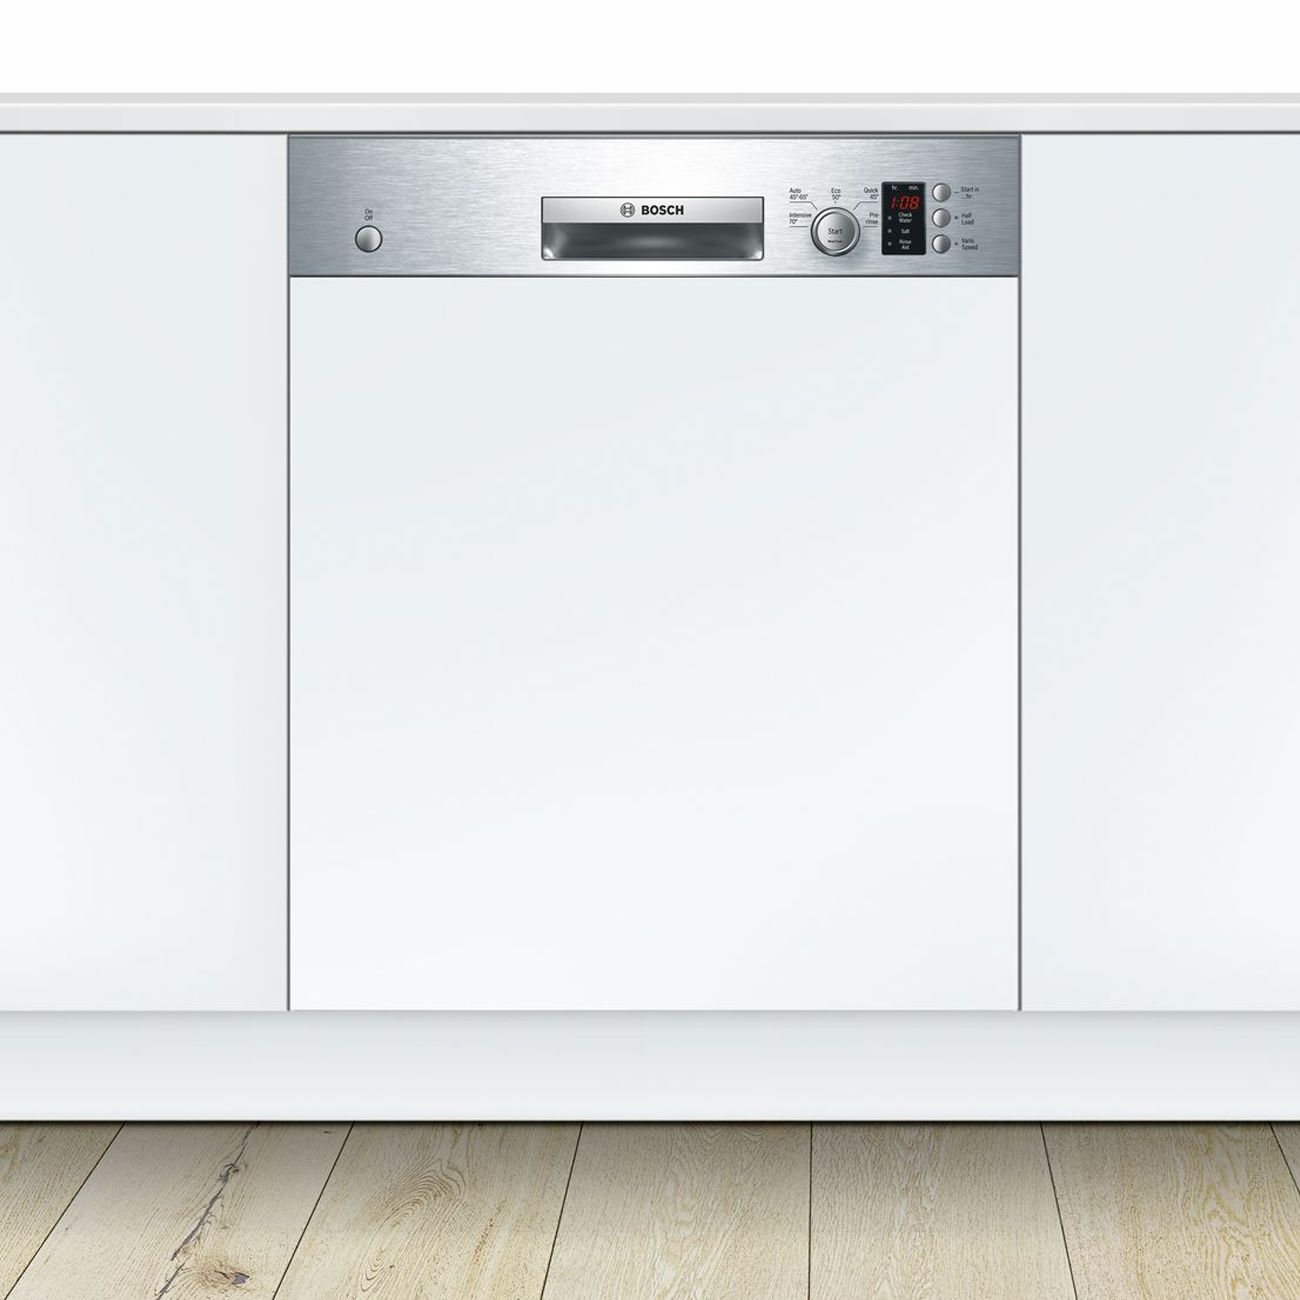 Bosch Range Top >> Bosch Serie 4 SMI50C15GB 60cm Stainless Steel Semi-Integrated Dishwasher - Sinks-Taps.com